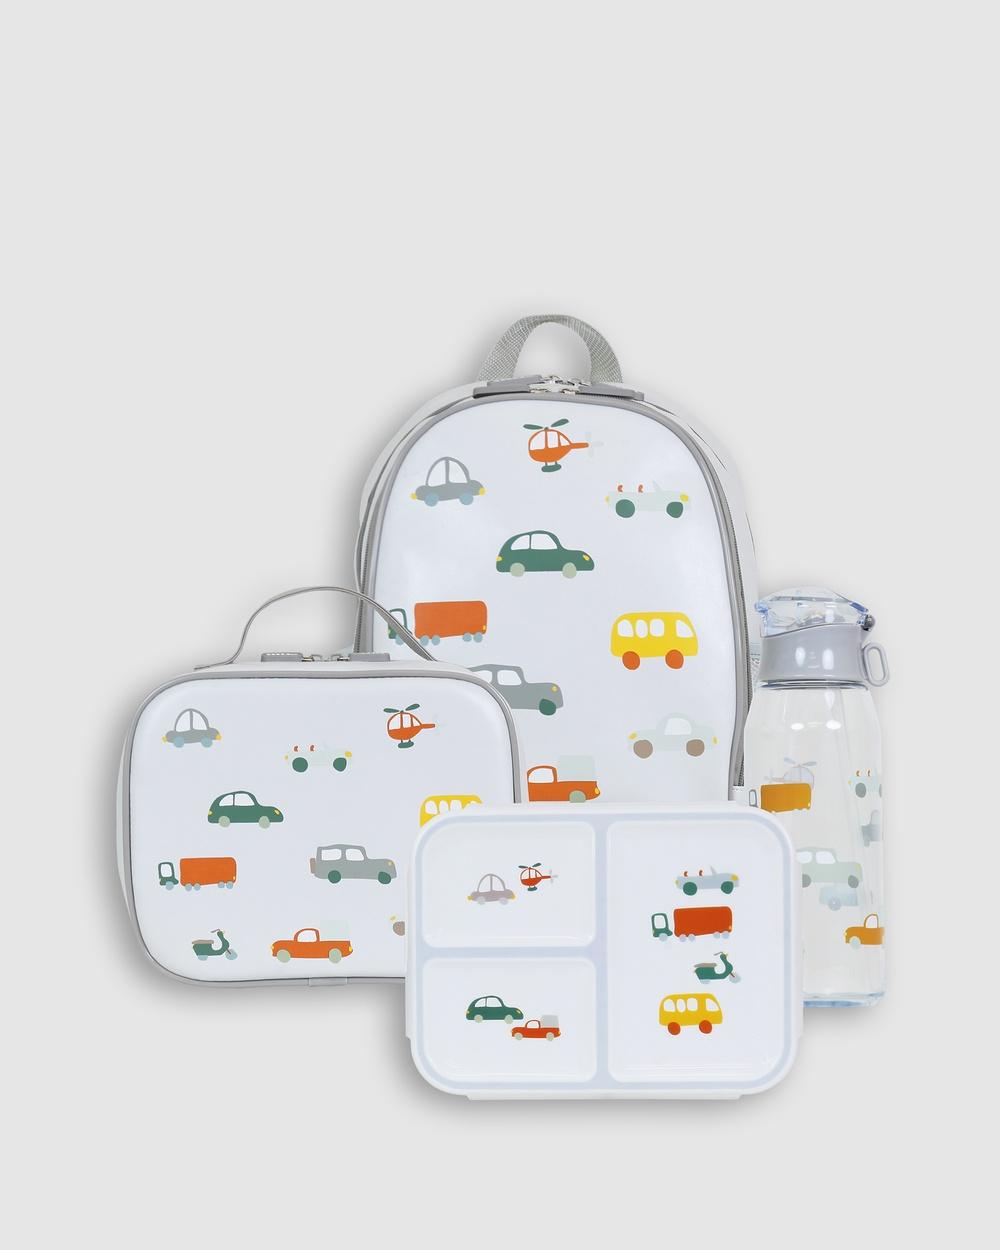 Bobbleart Large Backpack Lunch Bag Bento Box and Drink Bottle Traffic Backpacks Light Blue